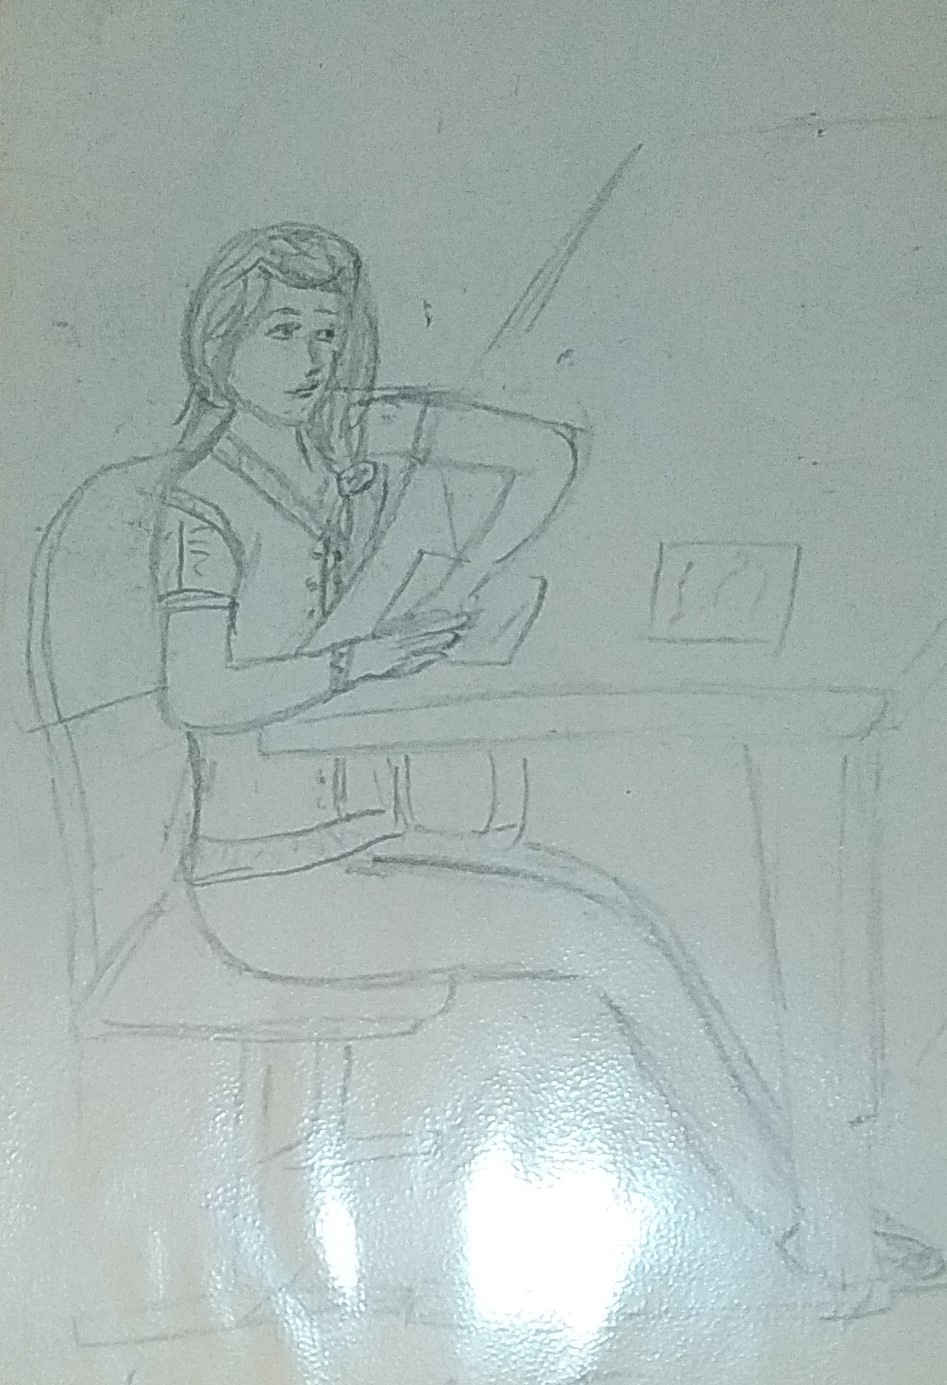 Zina Vladimirovna Parisva. Classmate at school